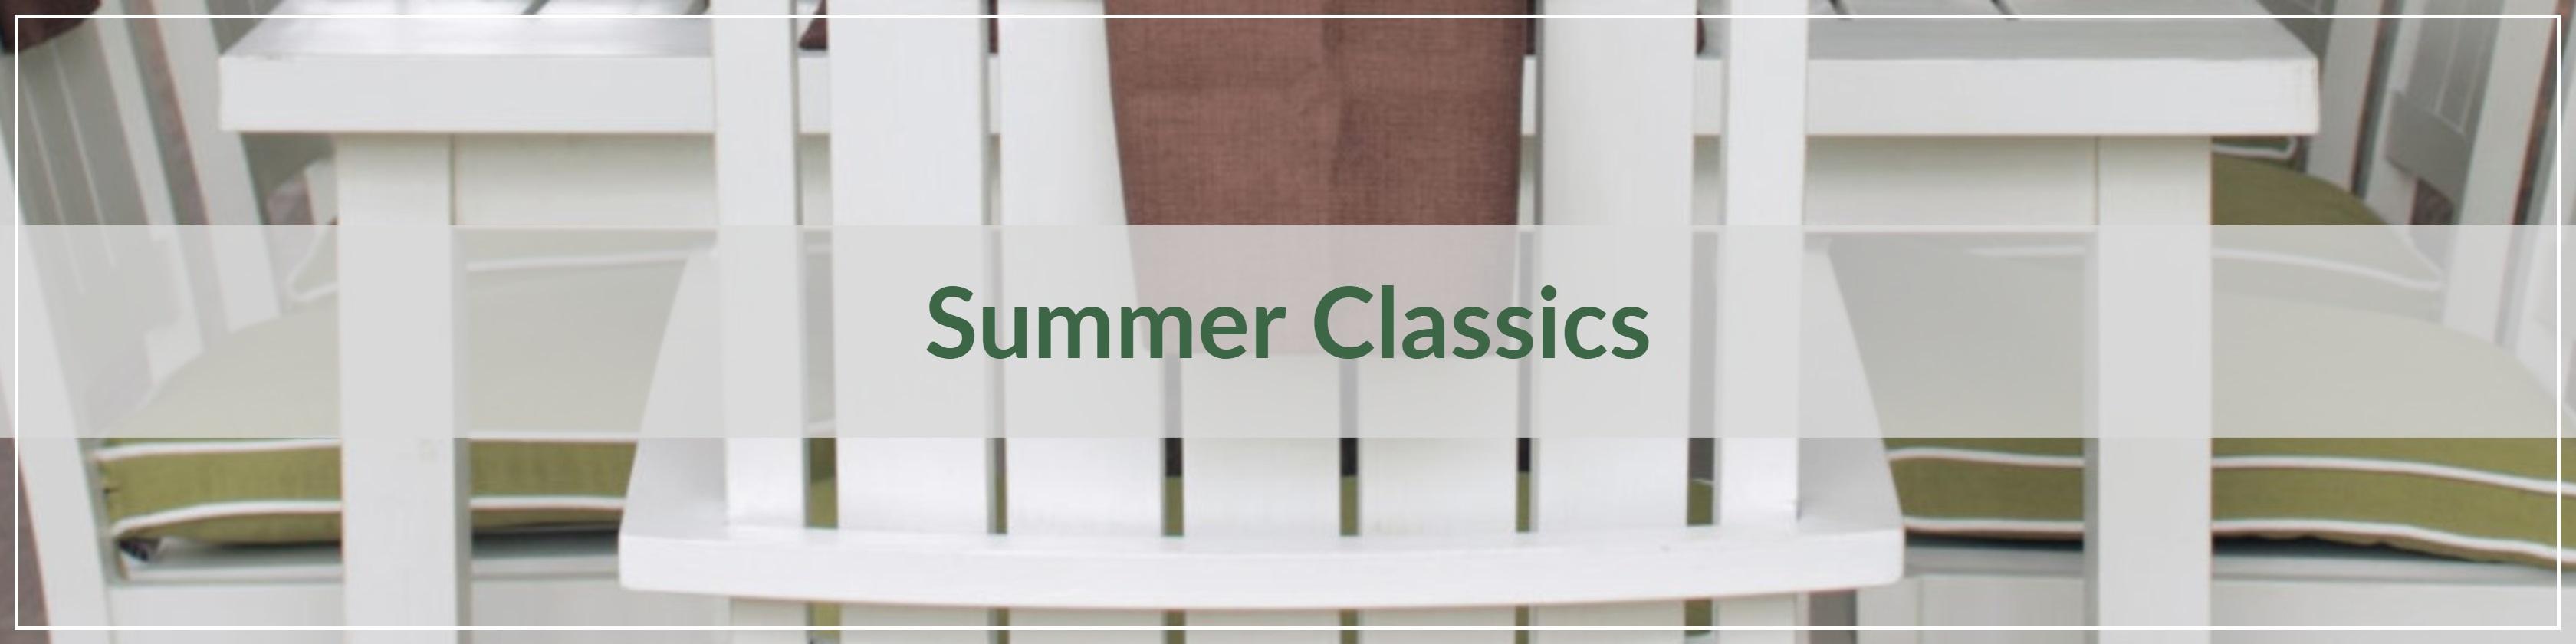 Summer Classics Extruded Aluminum Outdoor Dining